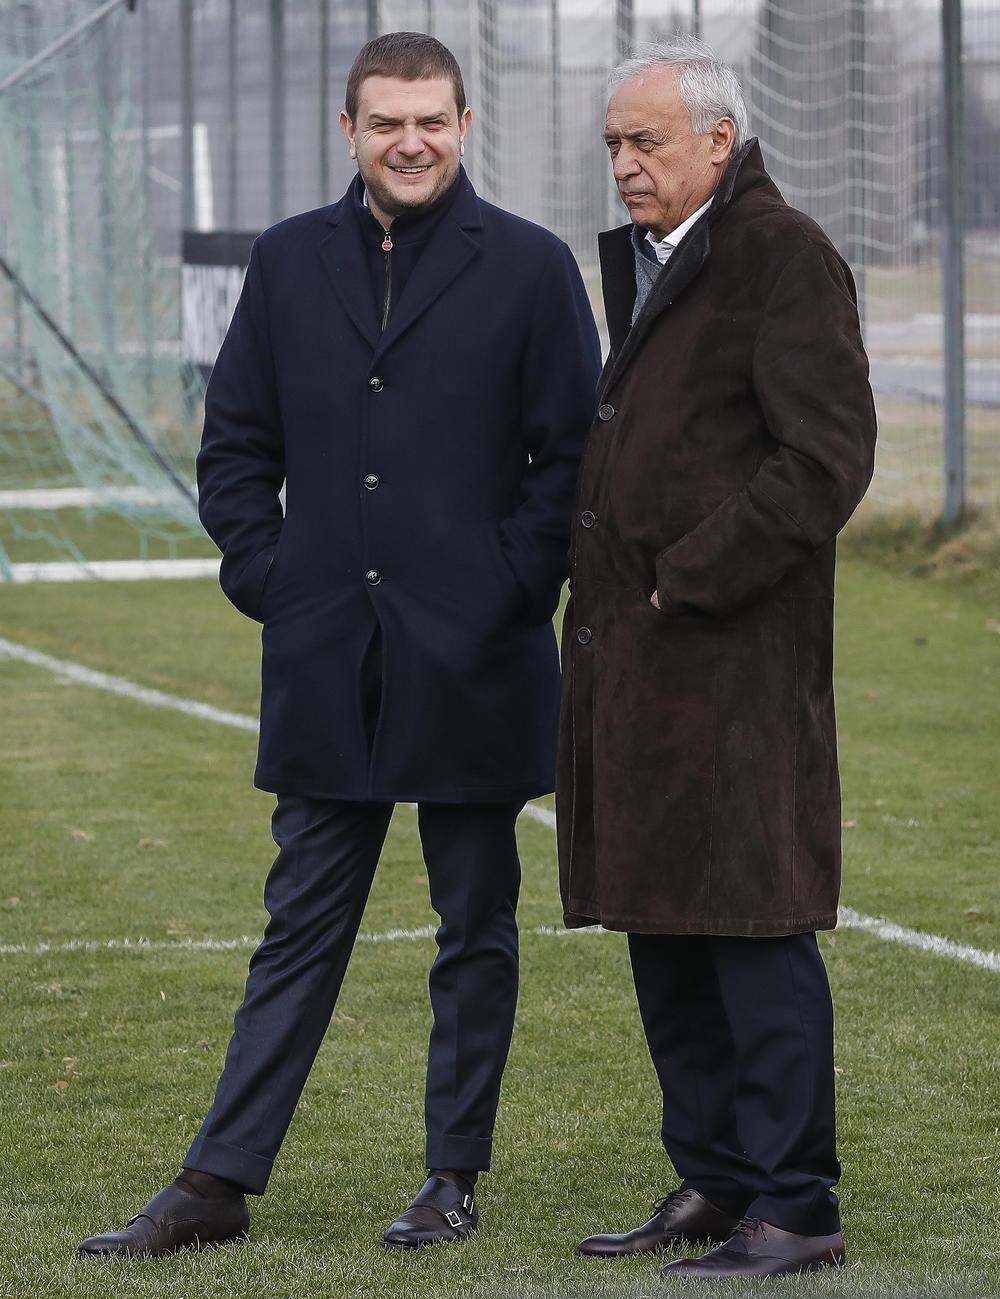 početak priprema, Miloš Vazura, Milorad Vučelić